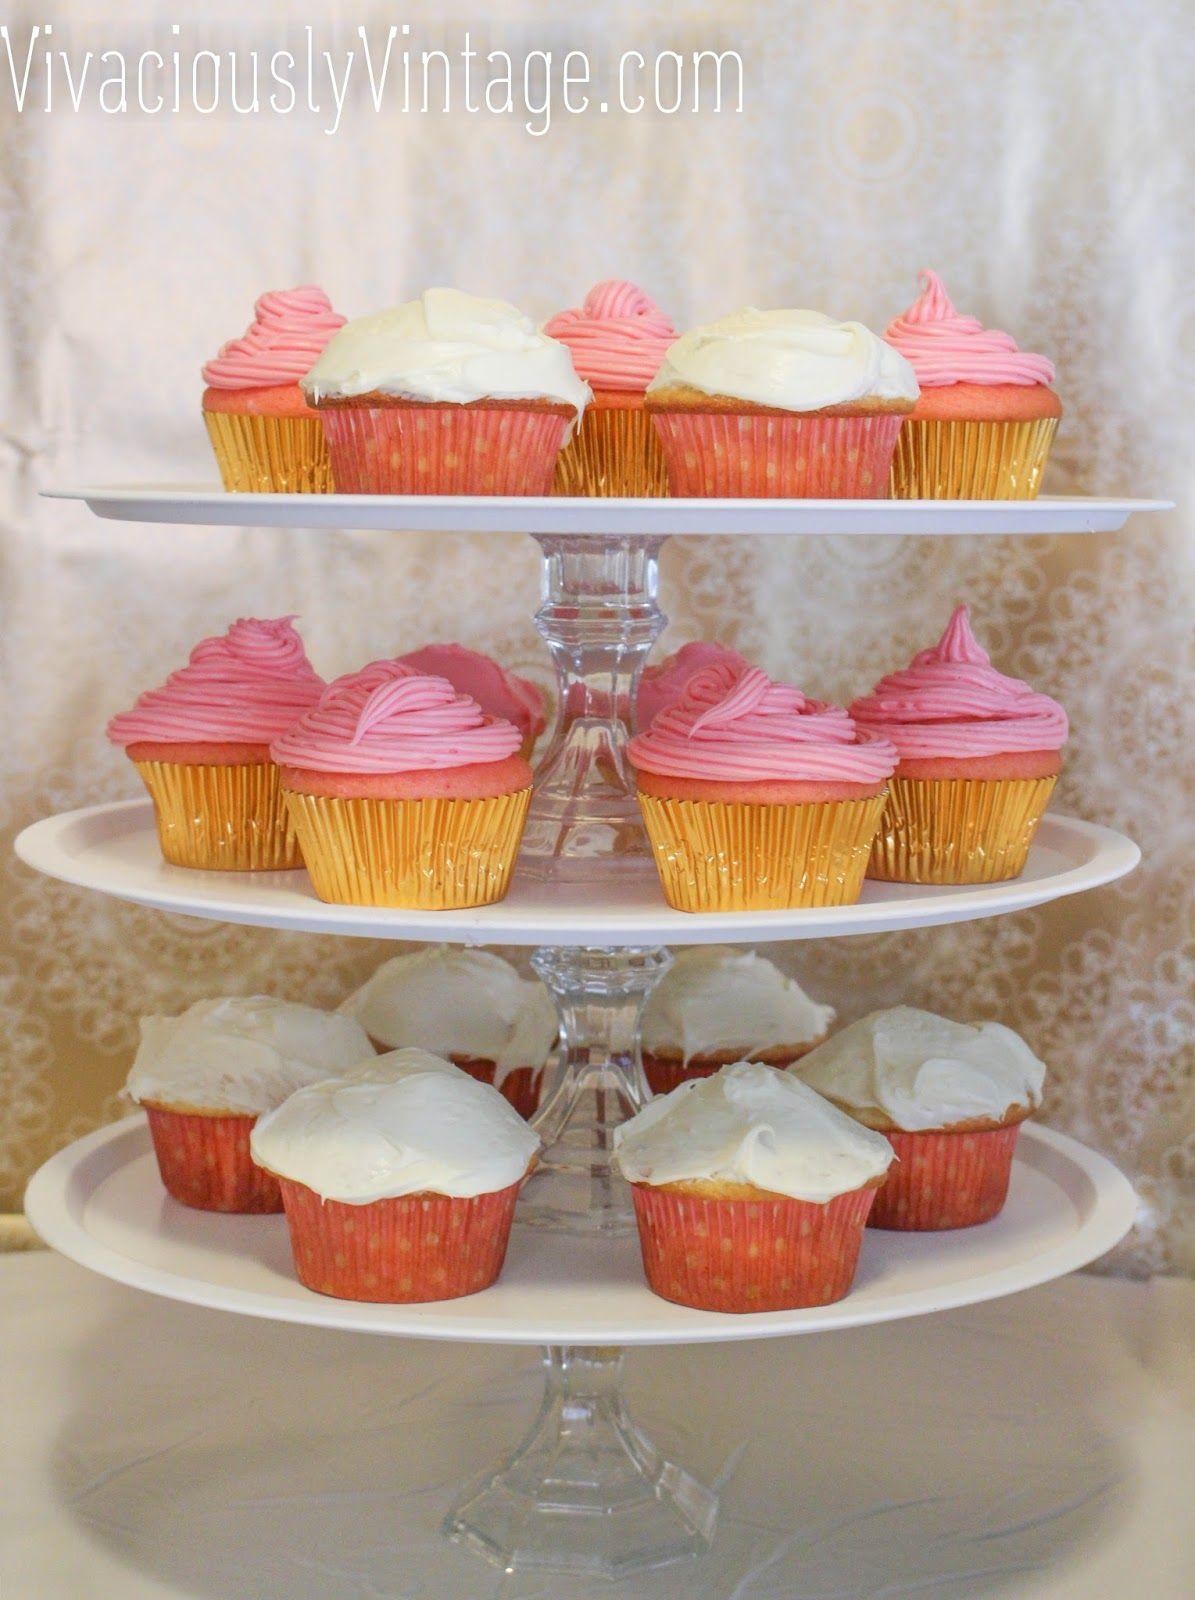 DIY 3 Tier Stand {Cupcake Stand, Coffee Station, Cake ...